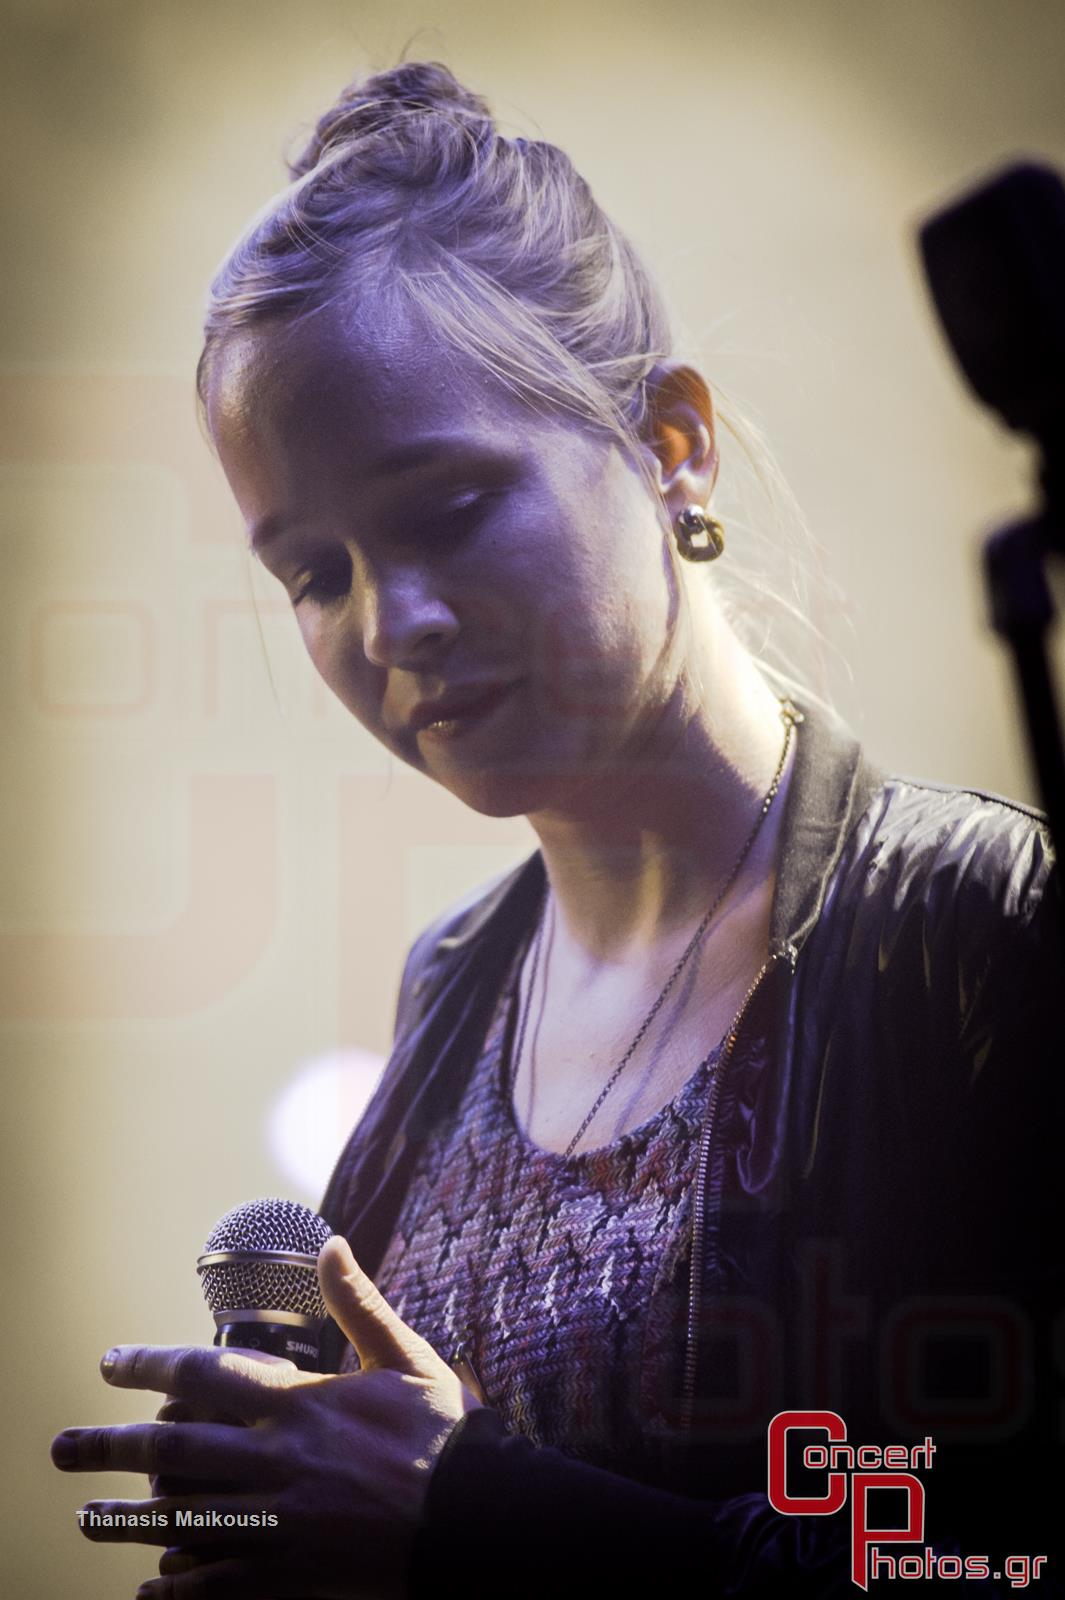 Active Member - Τραγούδα μας να φύγει το σκοτάδι- photographer: Thanasis Maikousis - concertphotos_-5743